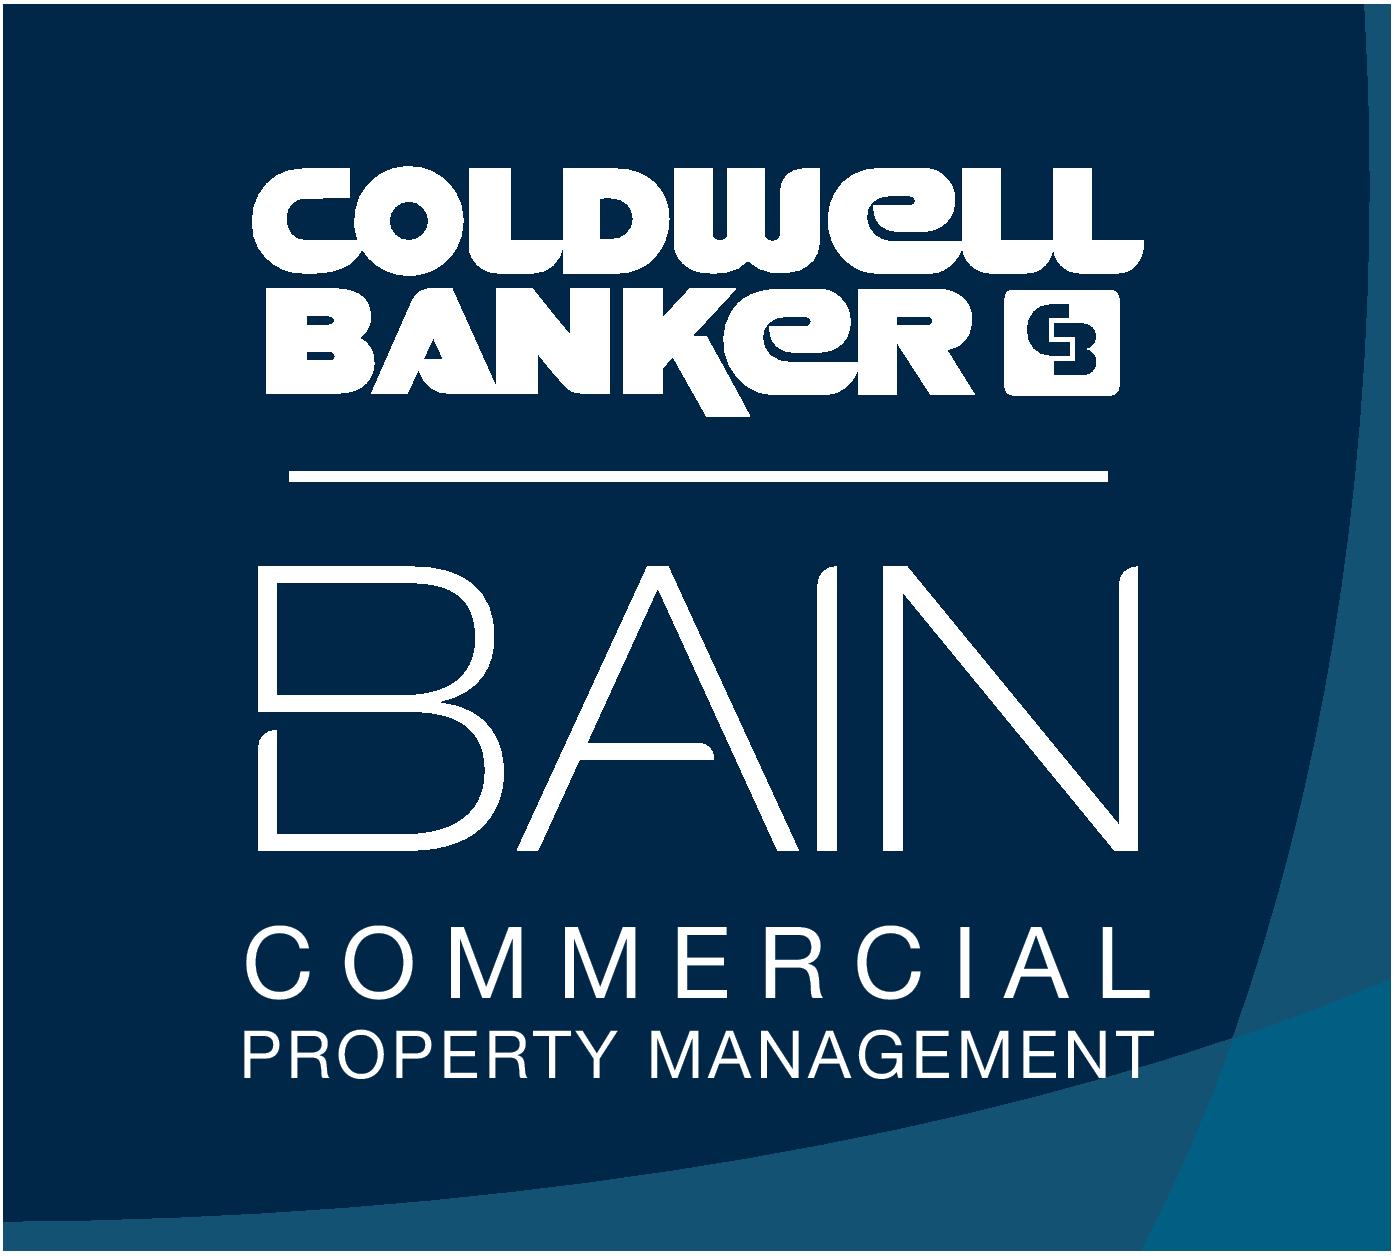 Commercial property management logo 2019